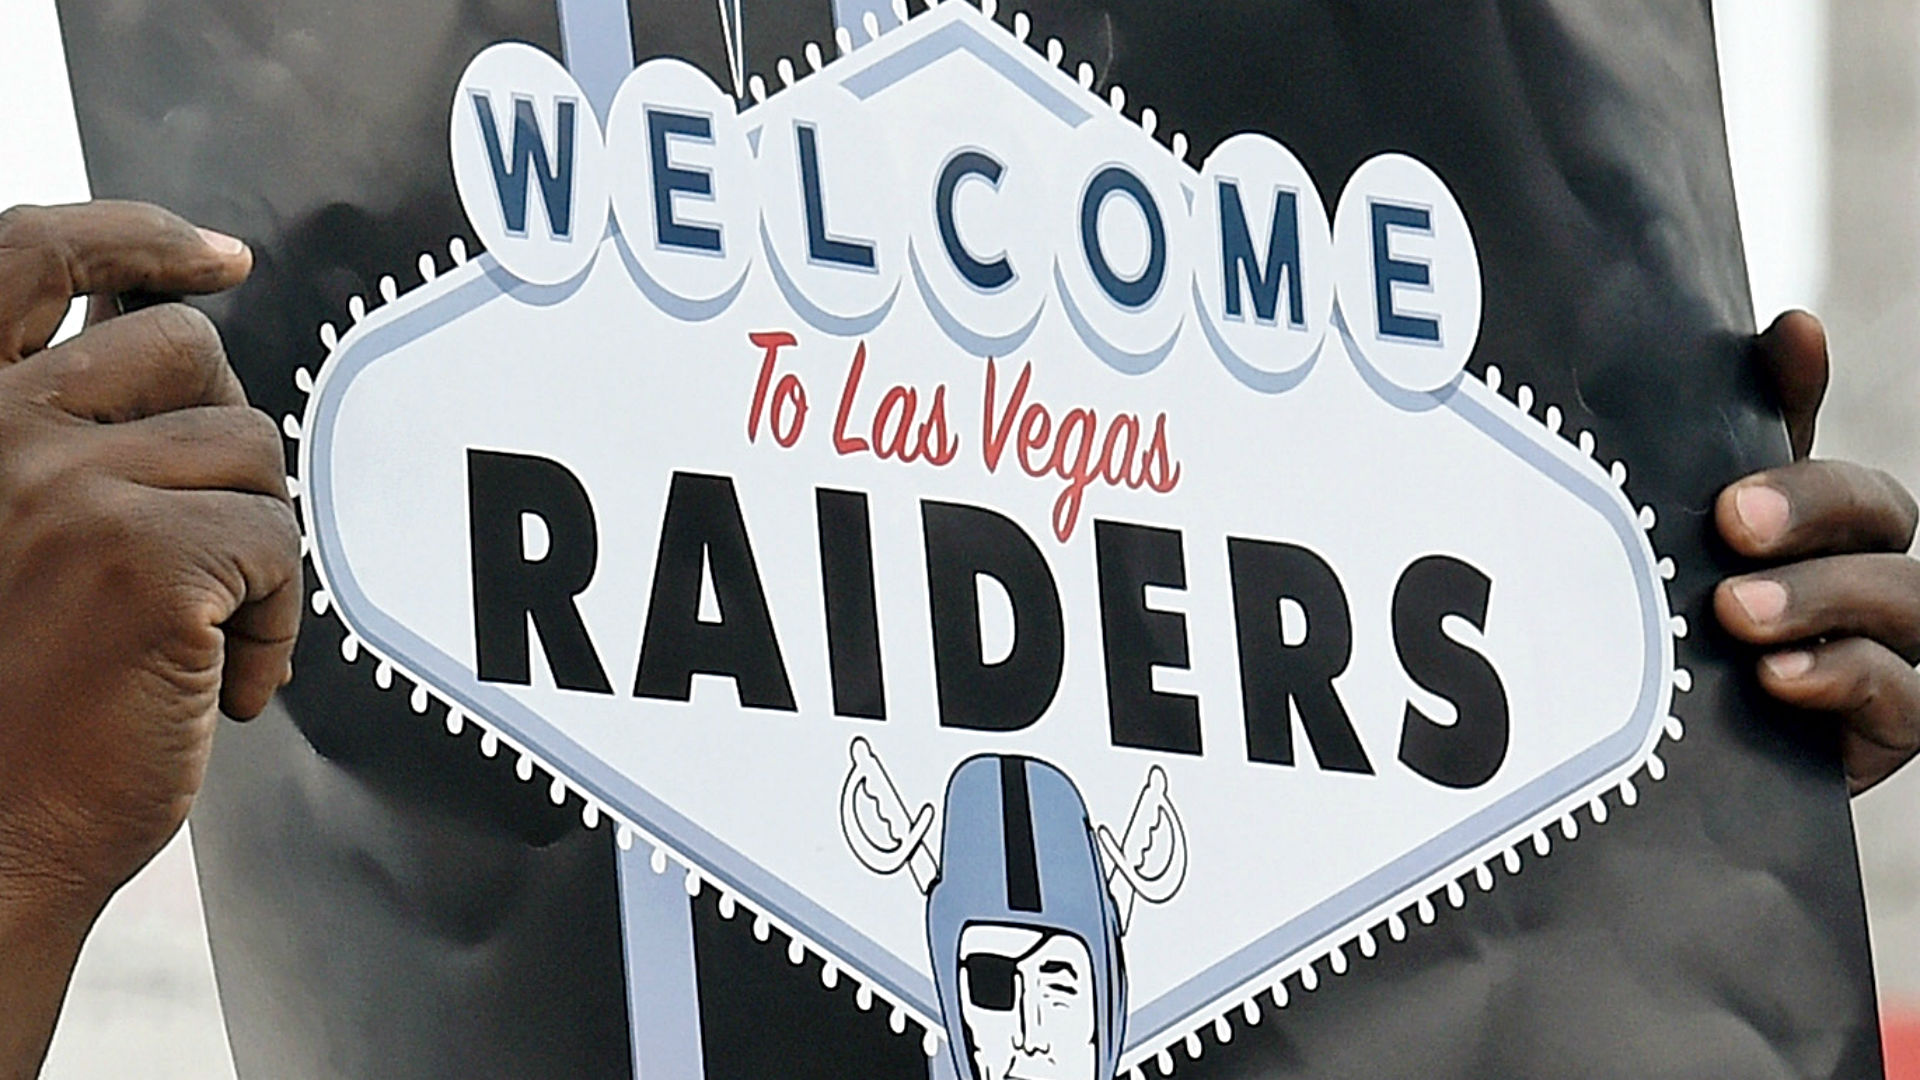 Raiders-vegas-sign-032817-getty-ftrjpg_1hrtdmpulcd1jzhos9j4gm4ml